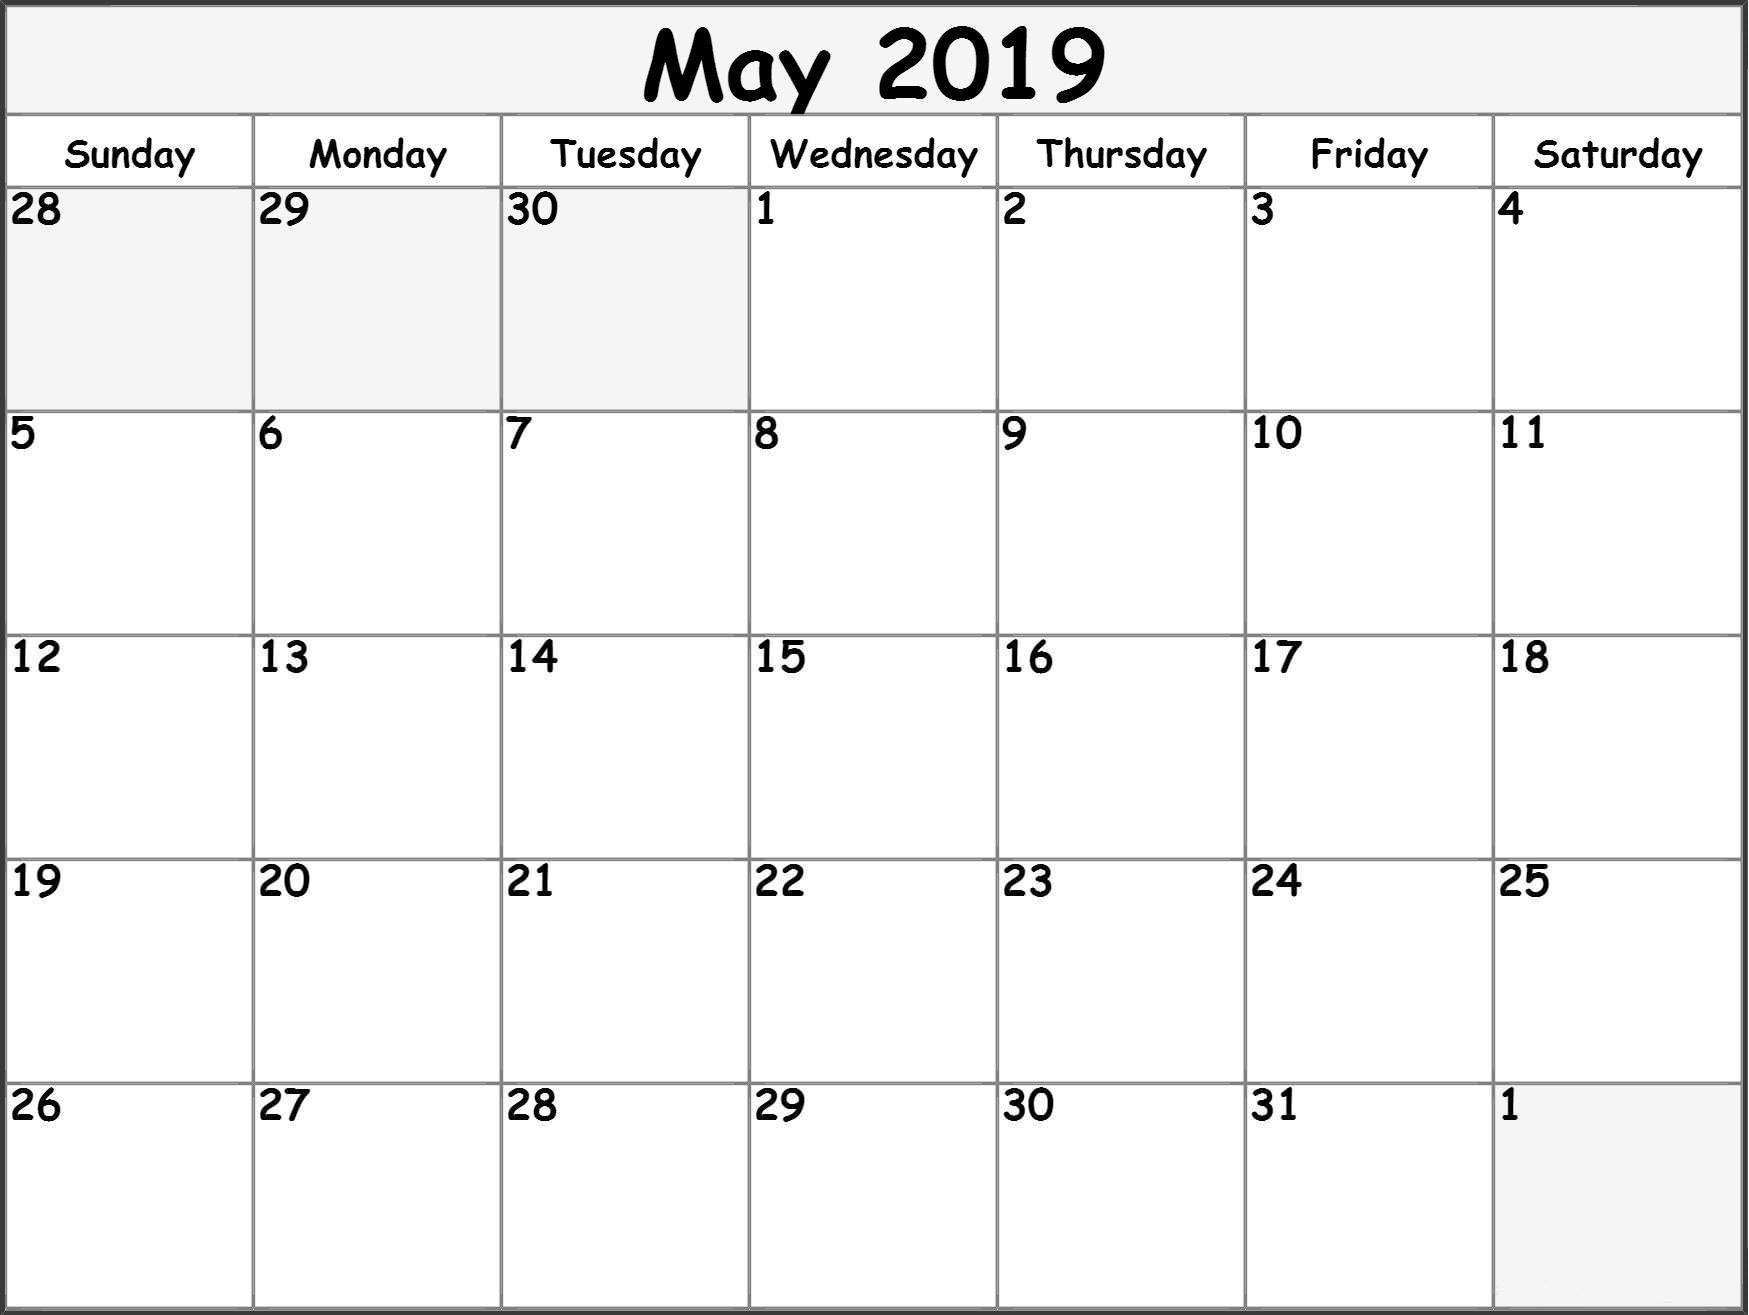 Calendar 2019 Free Printable Monthly May 2019 Printable Calendar Templates Free Blank Pdf